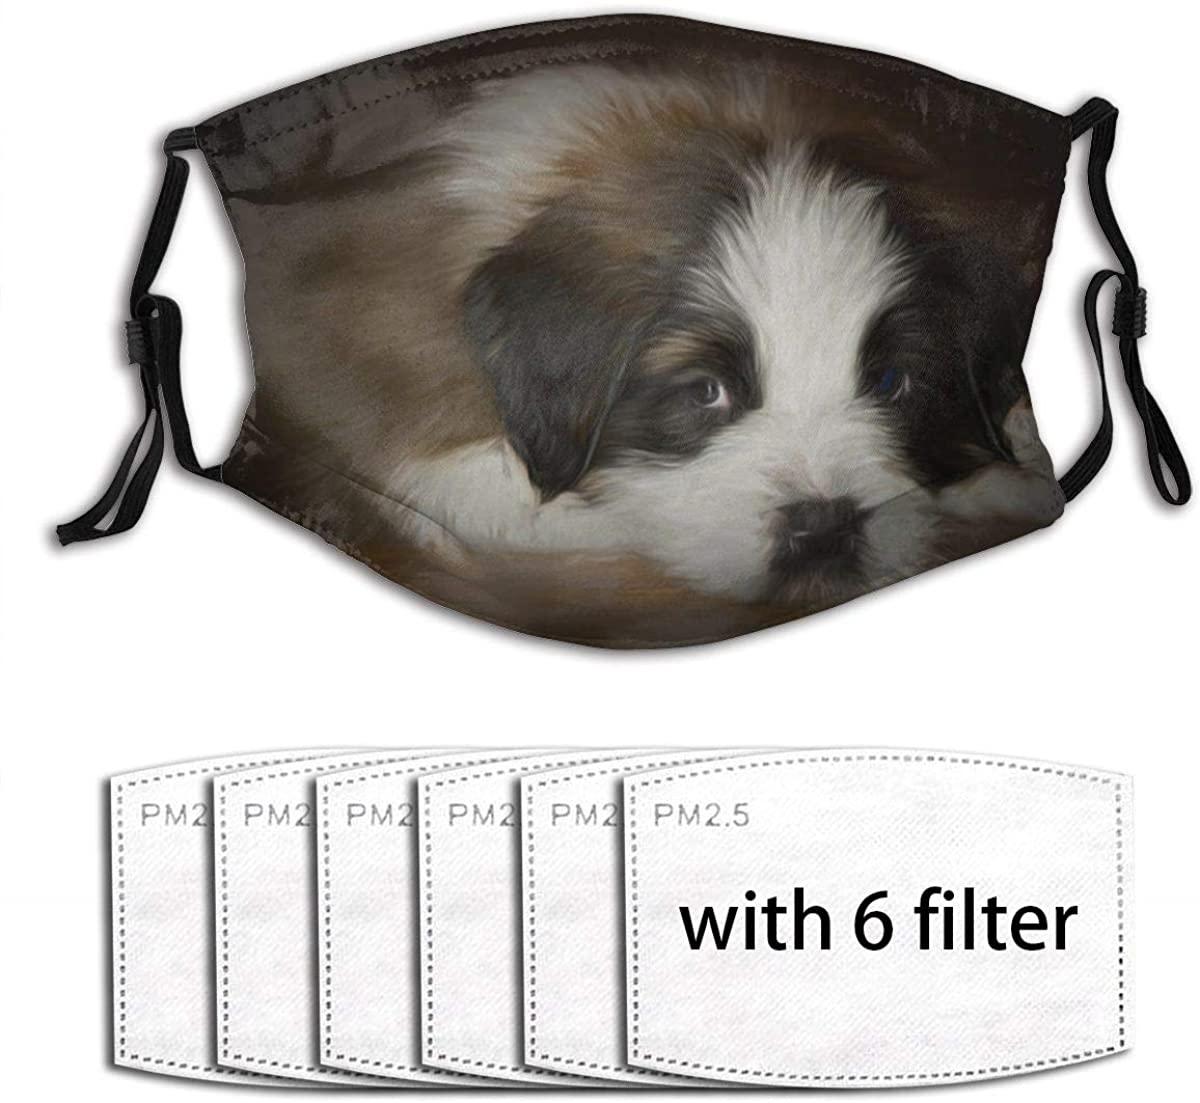 Colorful Saint Bernard Dog Print Unisex Reusable Comfortable Washable Facial Decorations (6 Filters)